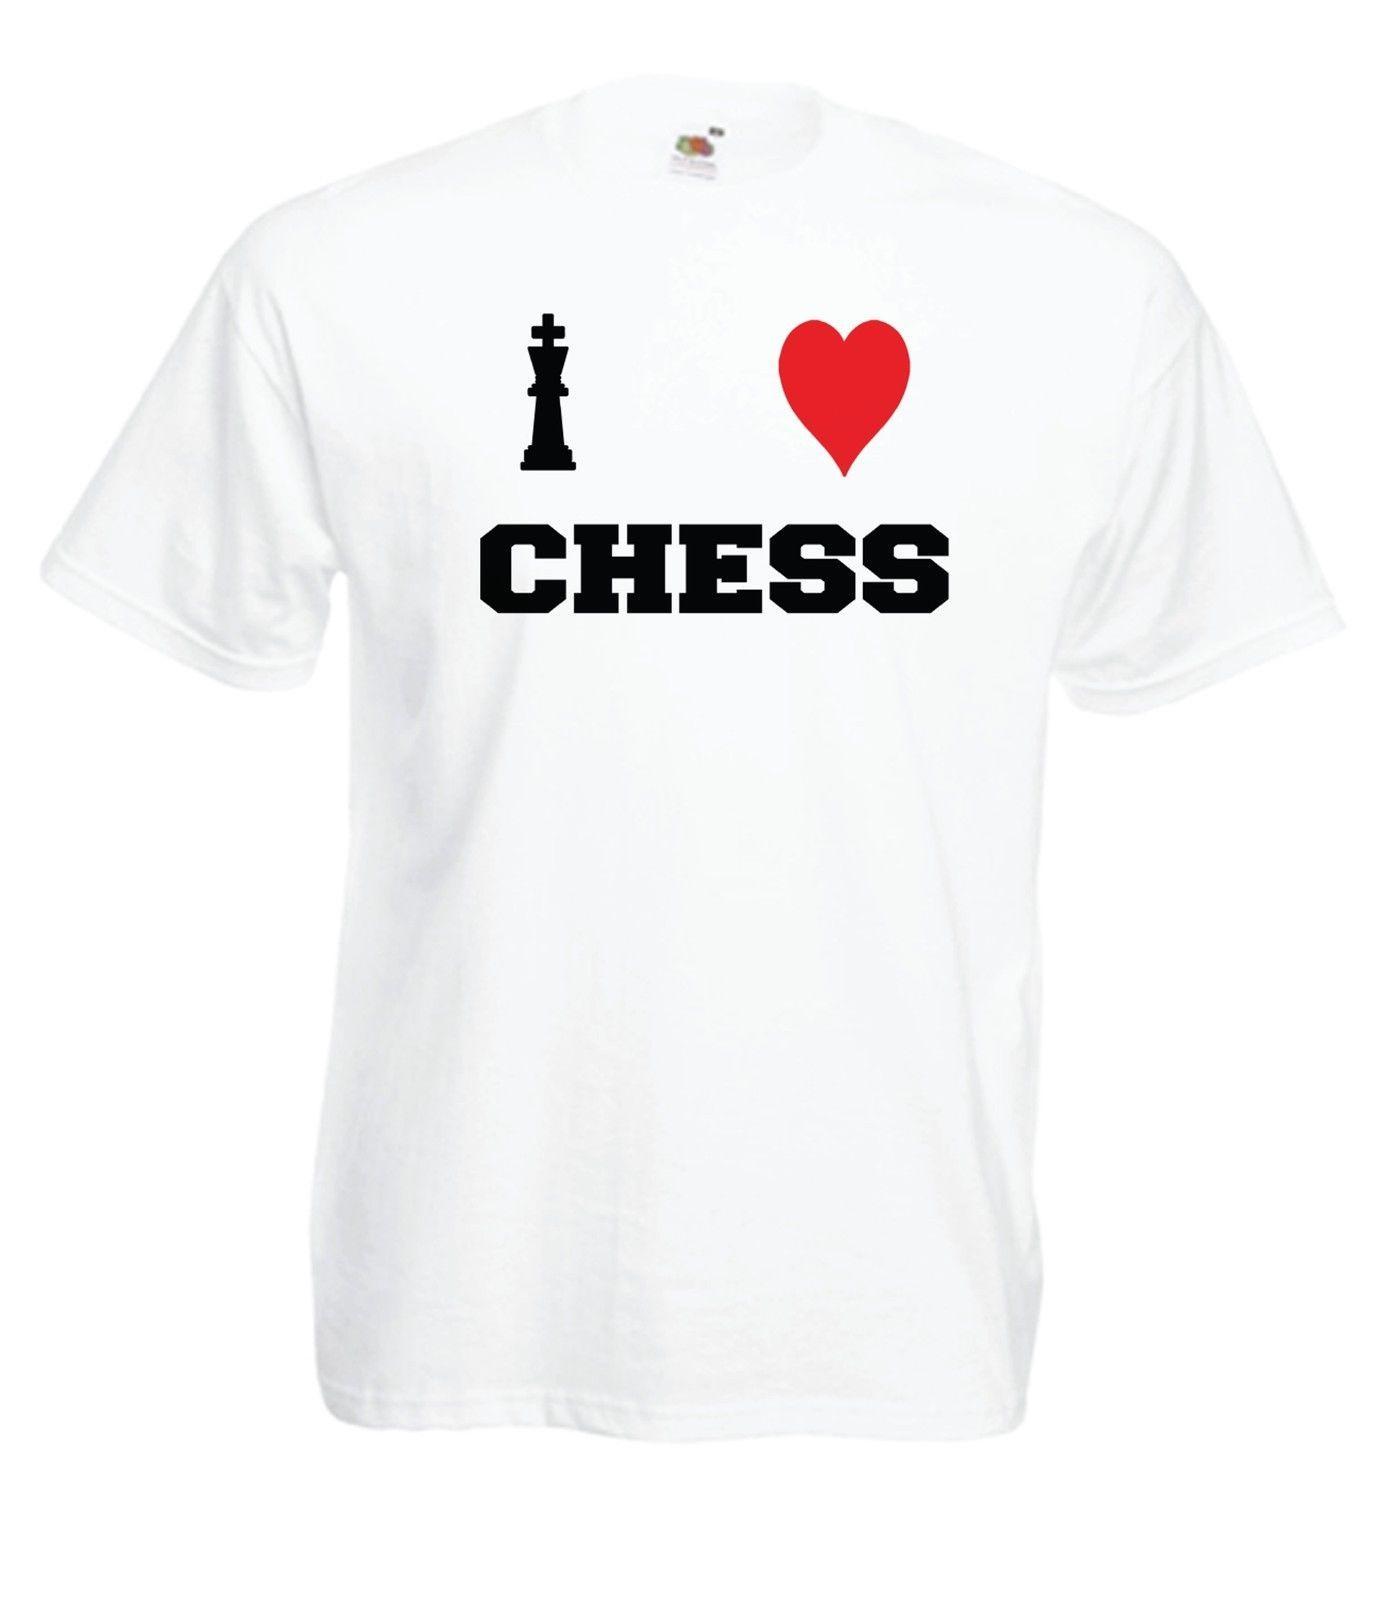 I LOVE CHESS Game Geek Nerd Gamer Birthday Xmas Gift Idea Mens Womens TSHIRT TOP Design Shirts Cool Tshirts From Goodclothes79 1148